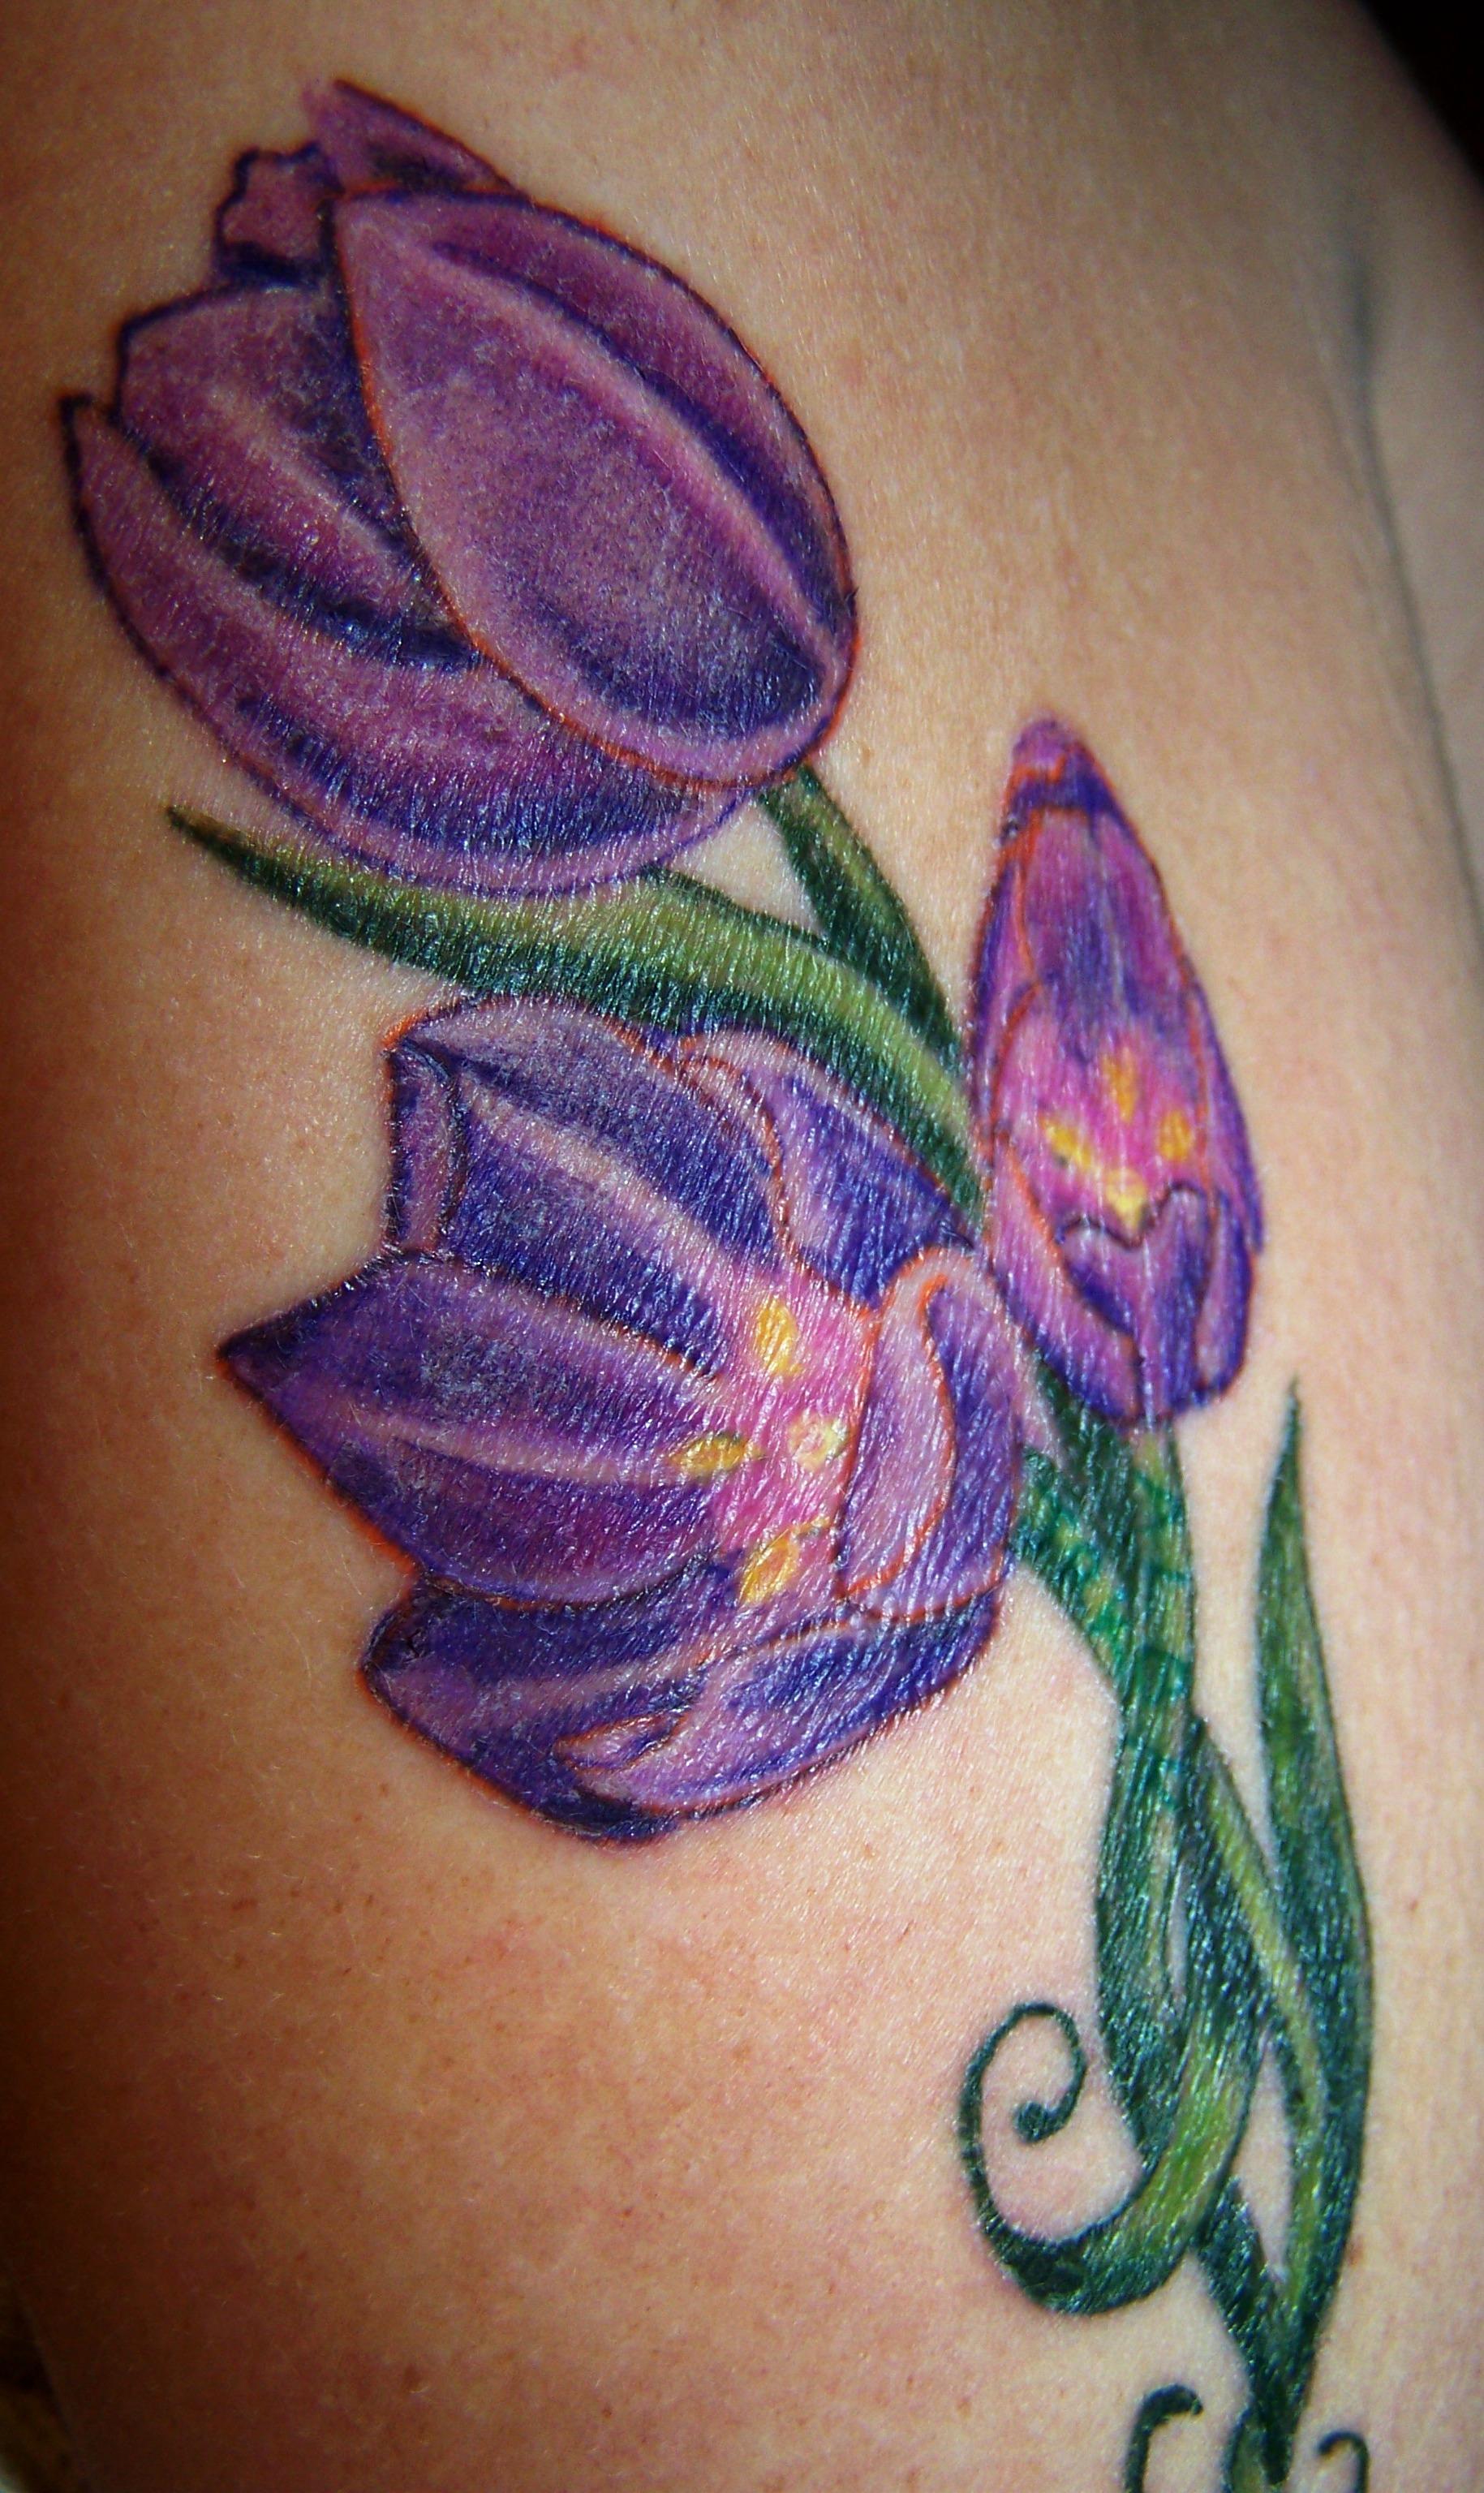 Blue Lotus Flower Tattoo Meaning 28 Lotus Flower Tattoo Designs